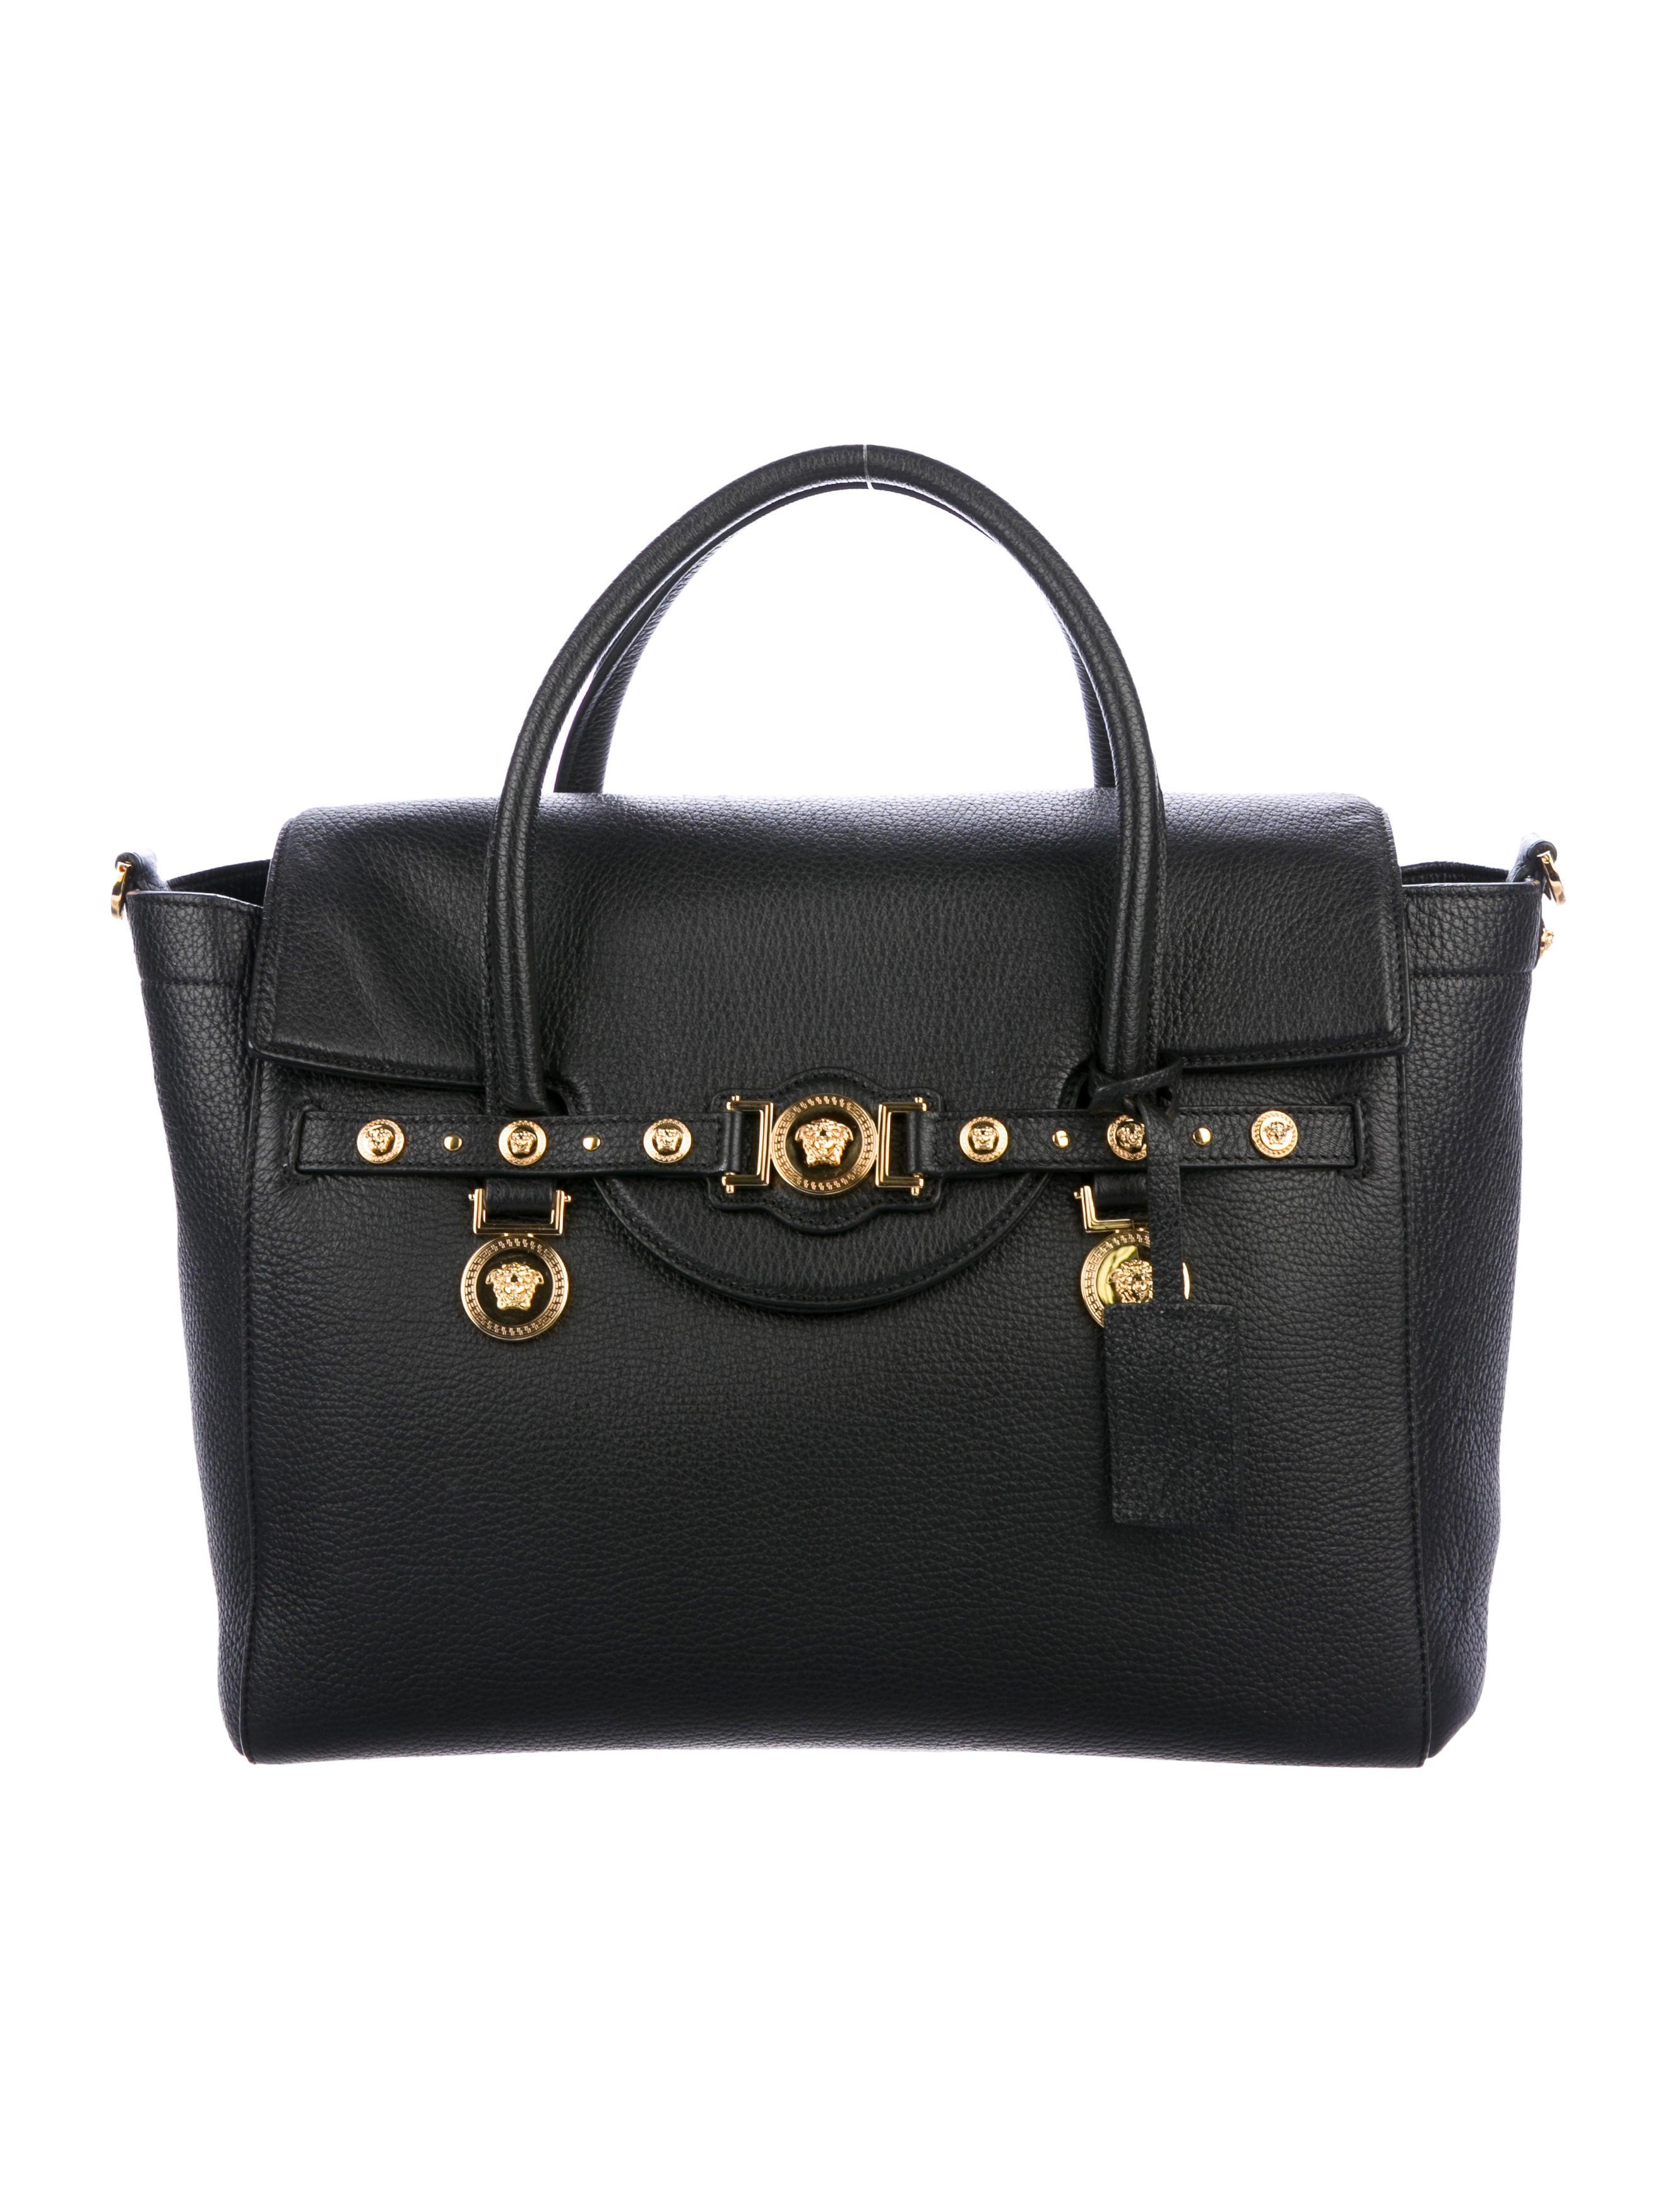 acc87900f4 Versace Leather Signature Bag - Handbags - VES38925